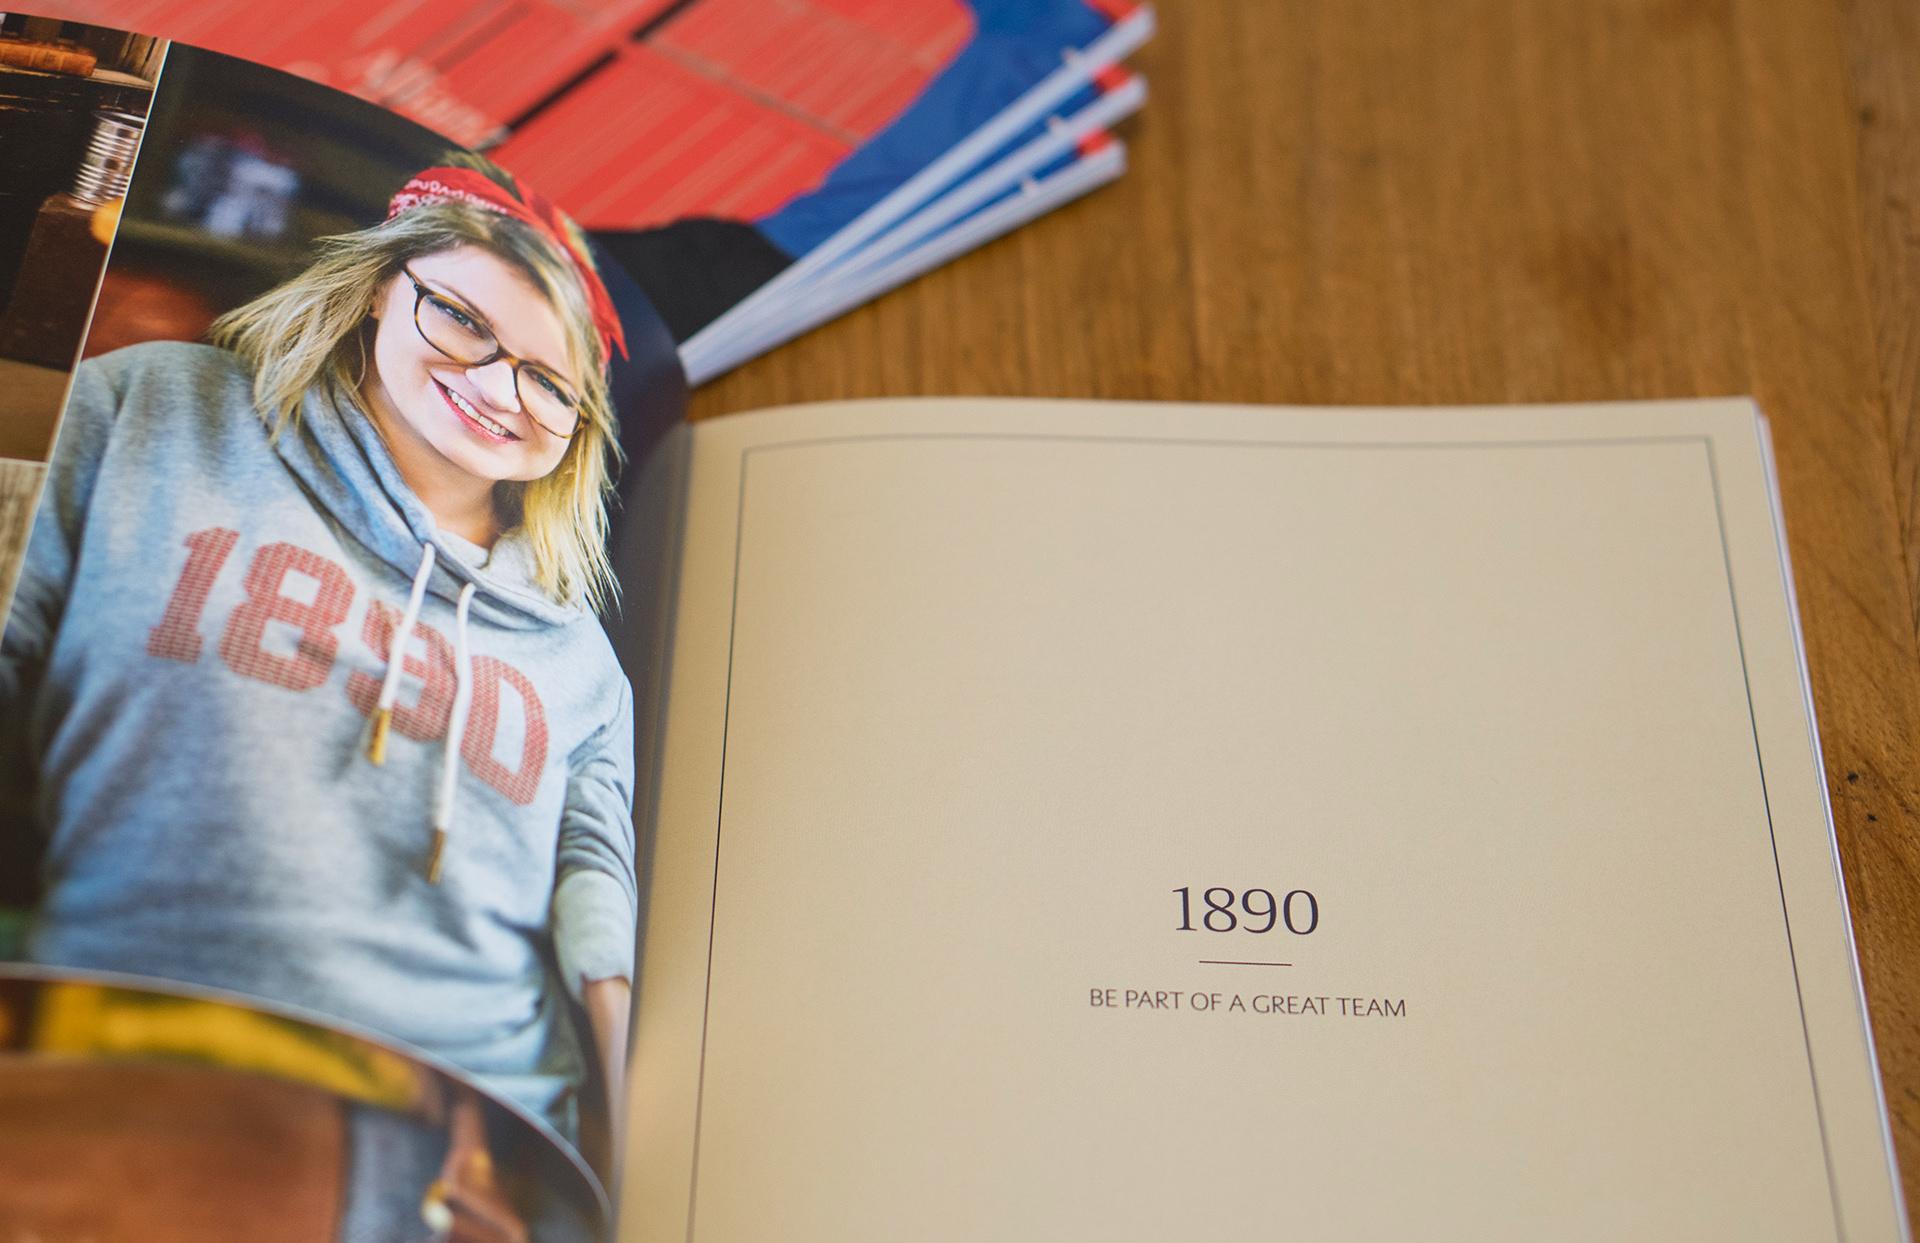 Allianz SE catalog katalog Marketing Strategy design fashion collection shooting 1890 layout print LAKE5 Consulting GmbH Hannover Germany